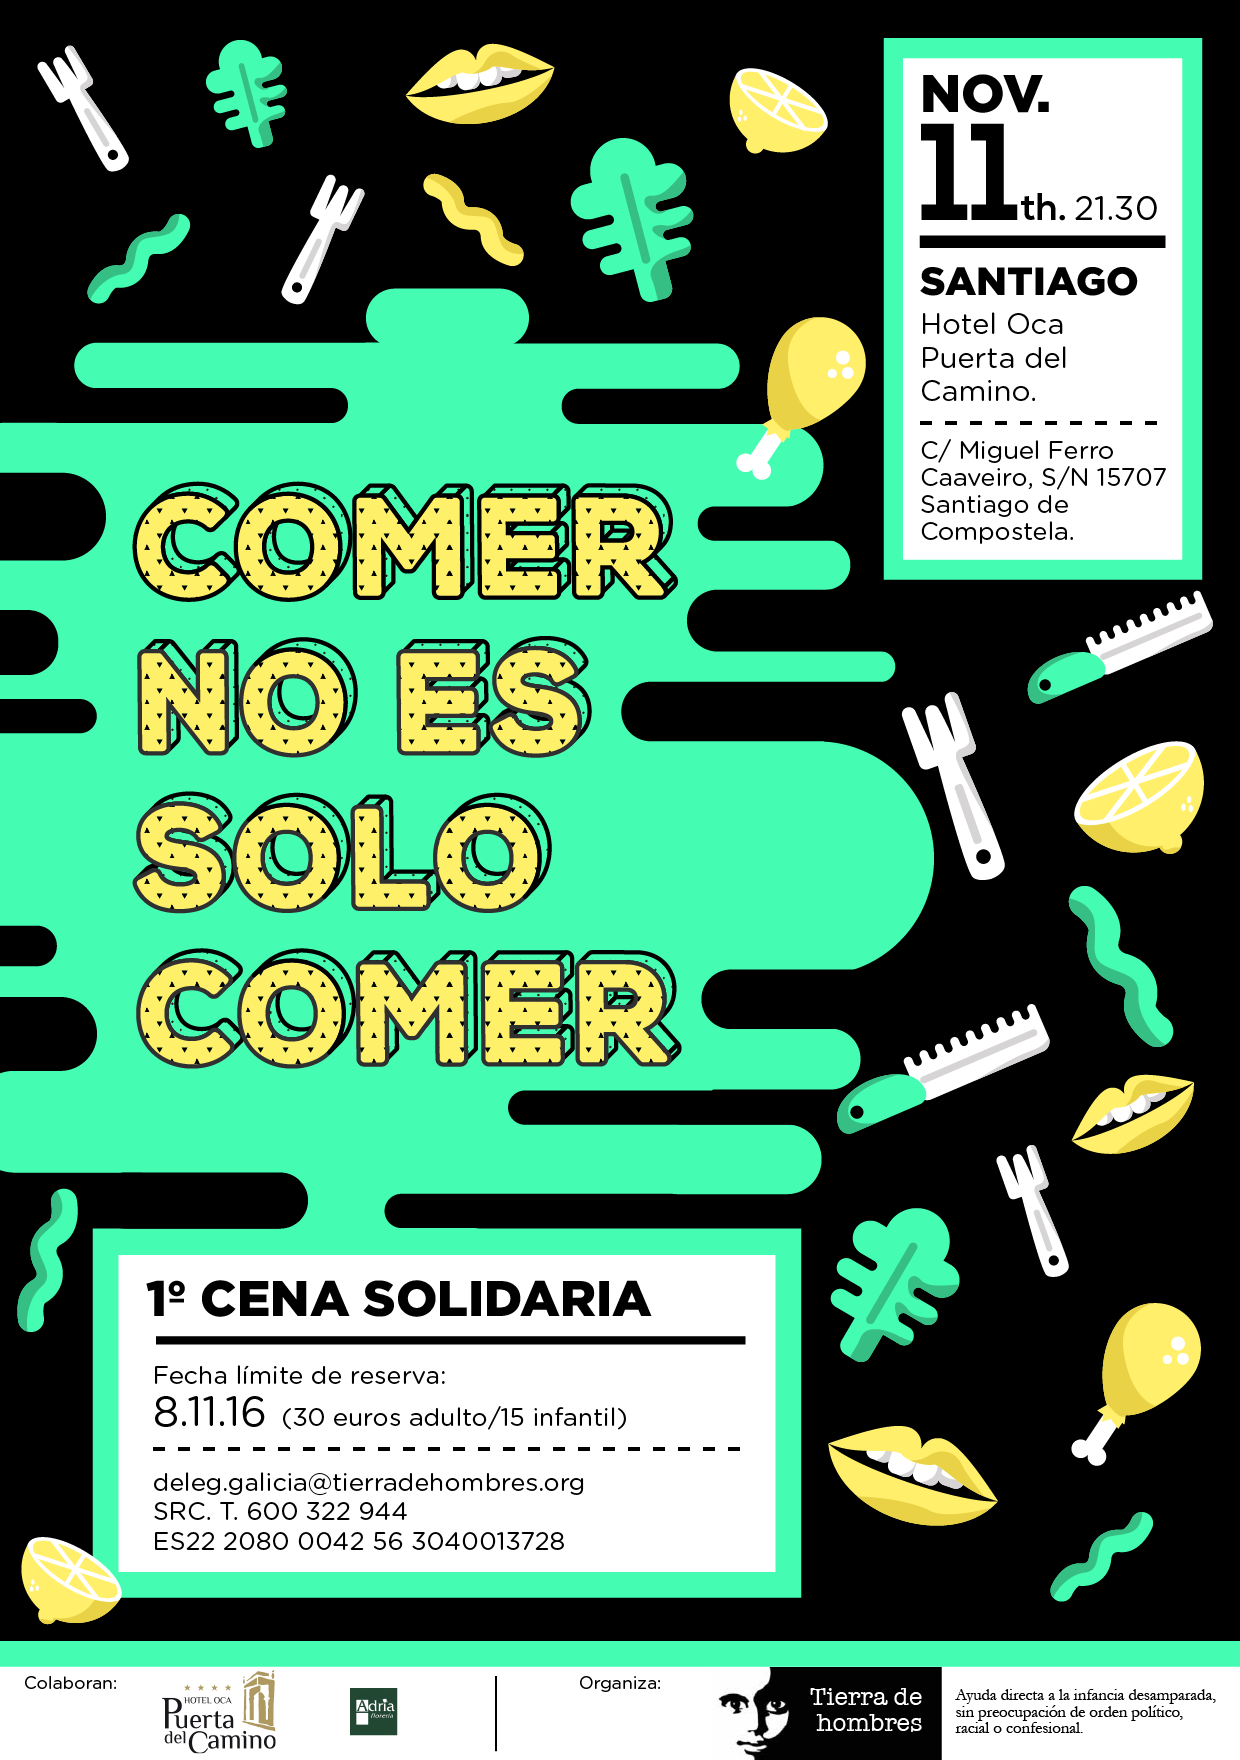 fotnot galicia cena solidaria ayuda infancia